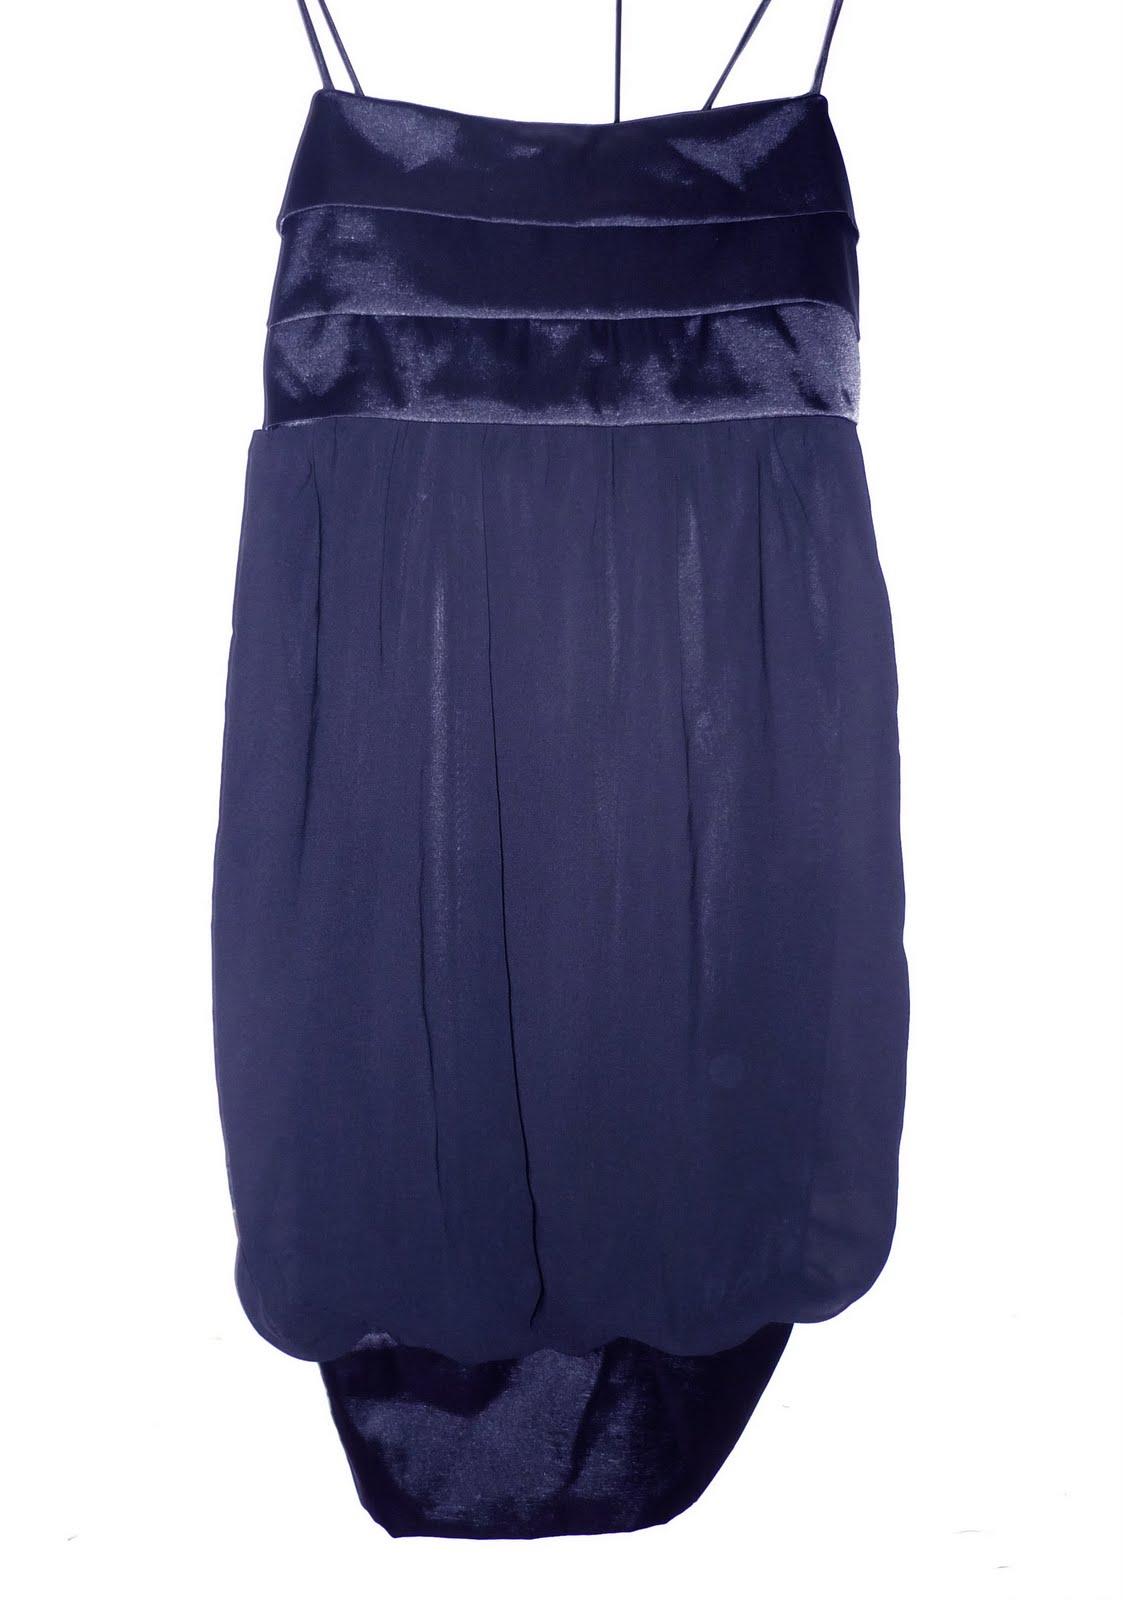 Cómo customizar un vestido de Zara-59-crimenesdelamoda